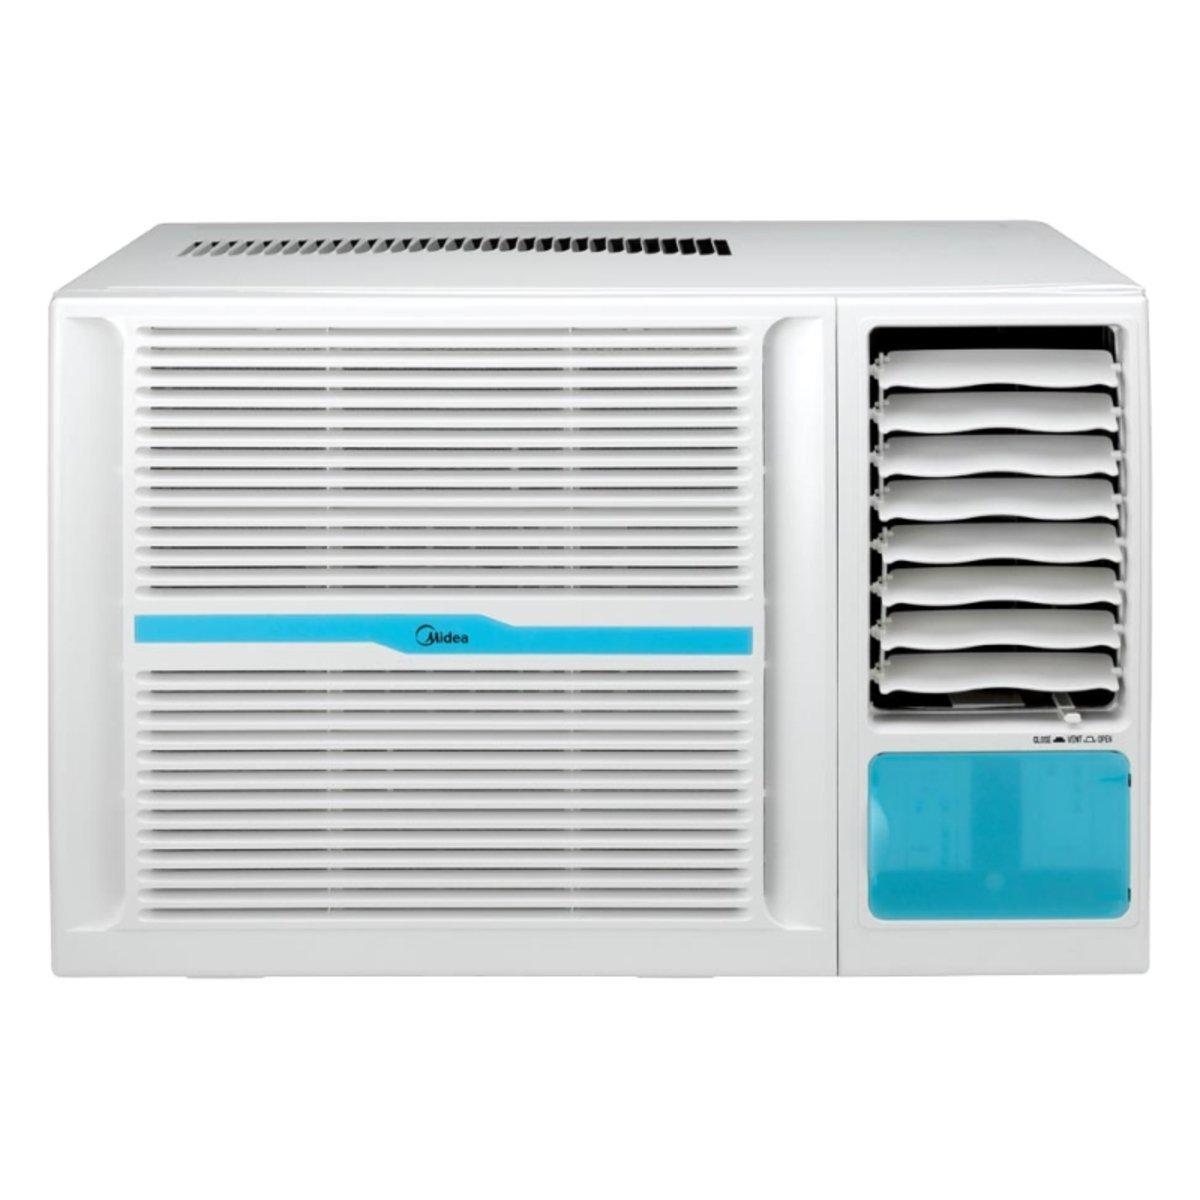 MWH07CM3X1 3/4HP WINDOW TYPE AIR CONDITIONER